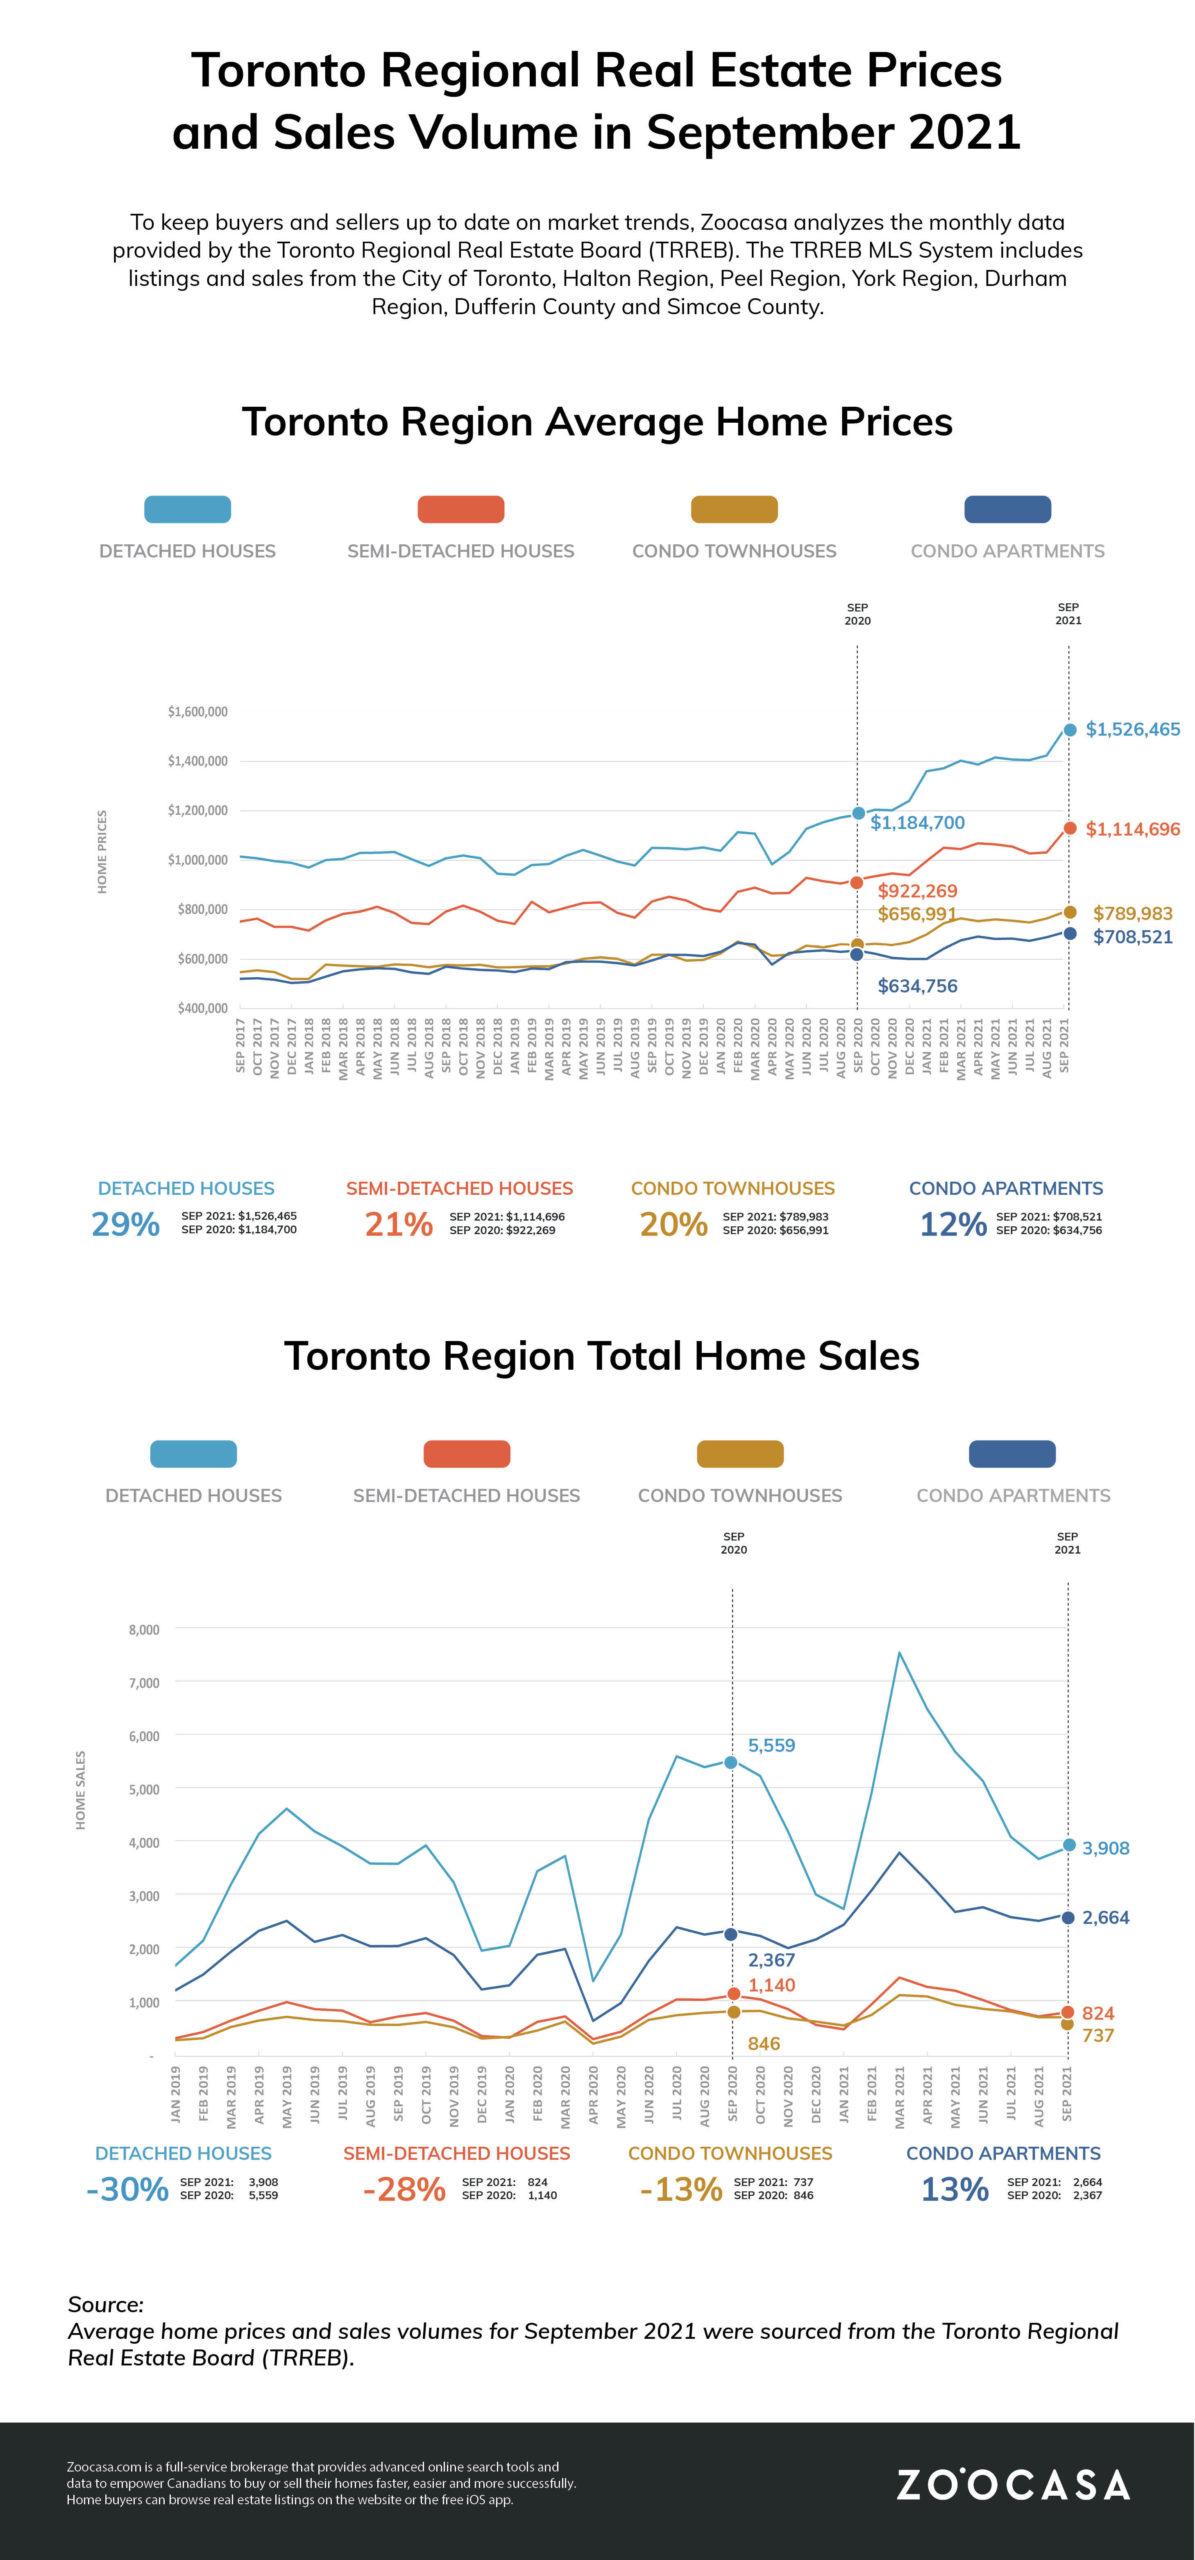 GTA Real Estate Market Update September